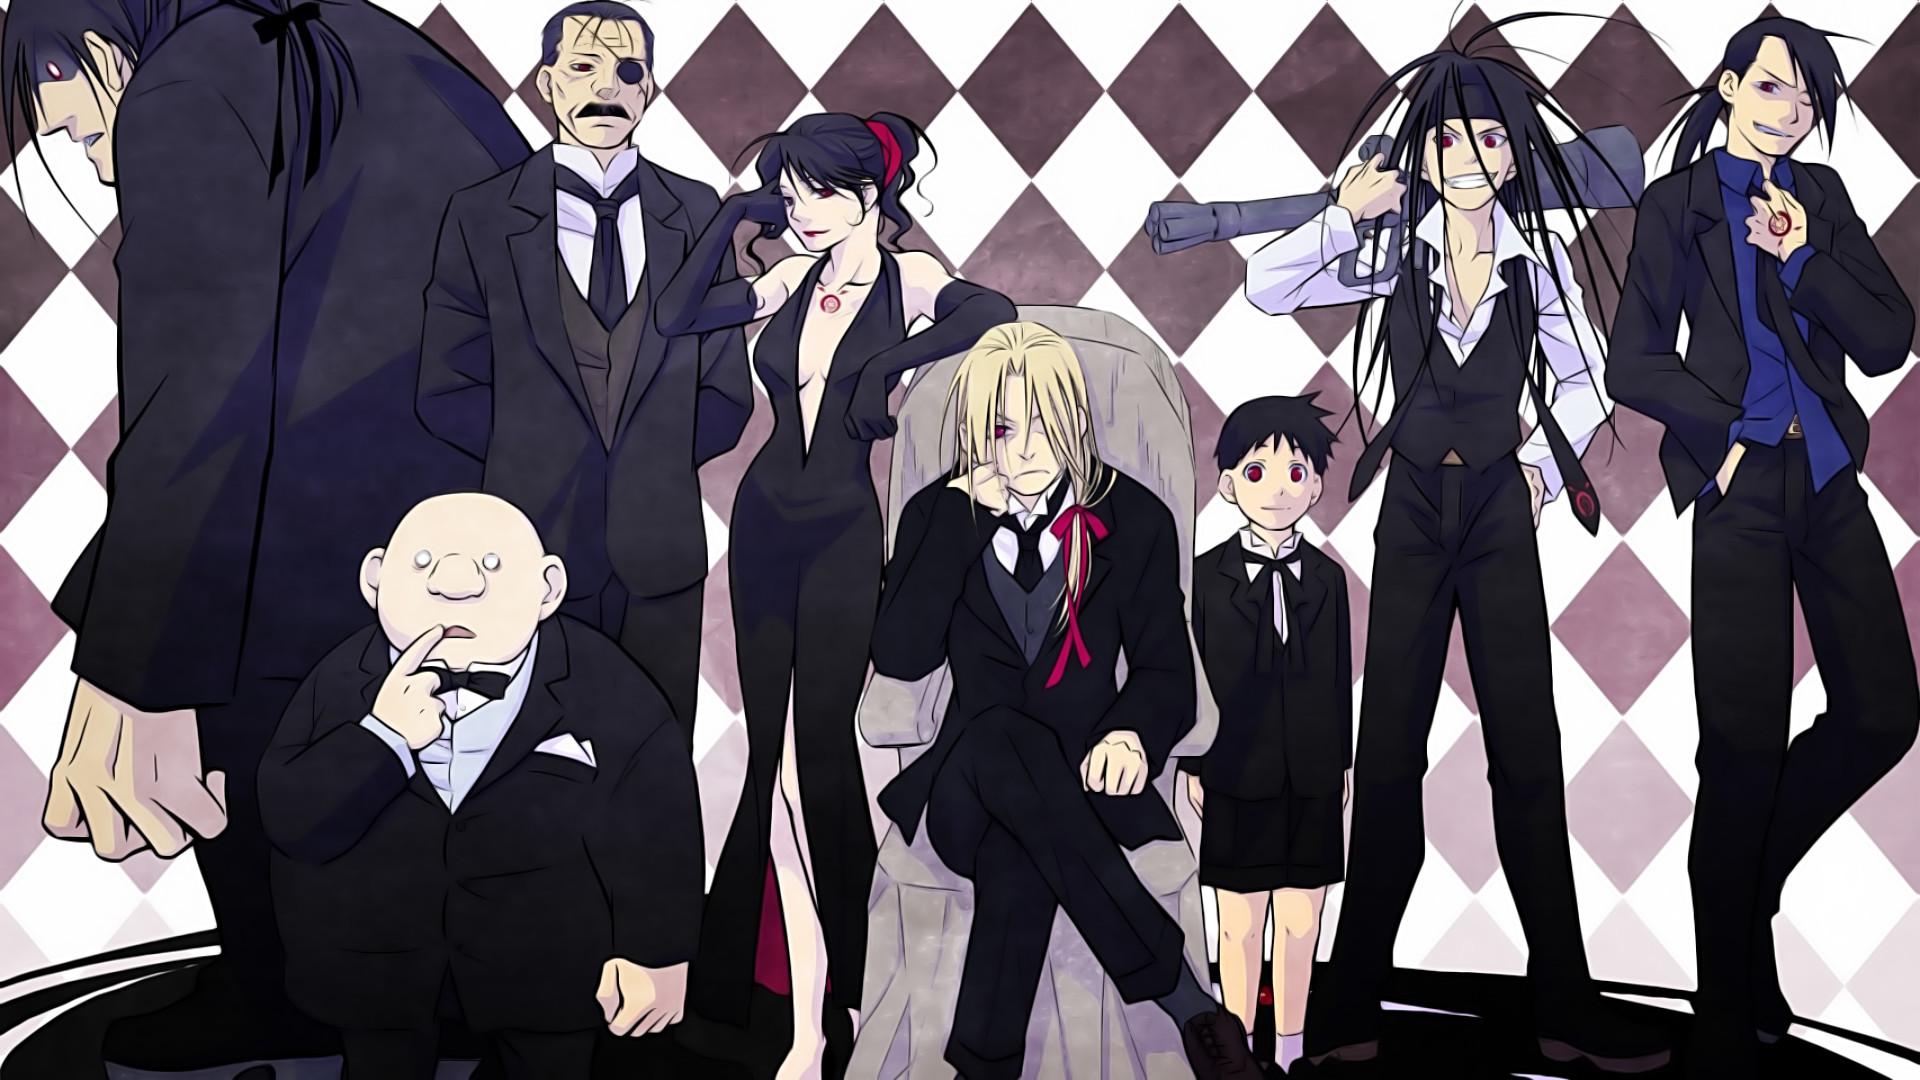 Res: 1920x1080, Anime - FullMetal Alchemist Father (Fullmetal Alchemist) Lust (Fullmetal  Alchemist) Pride (